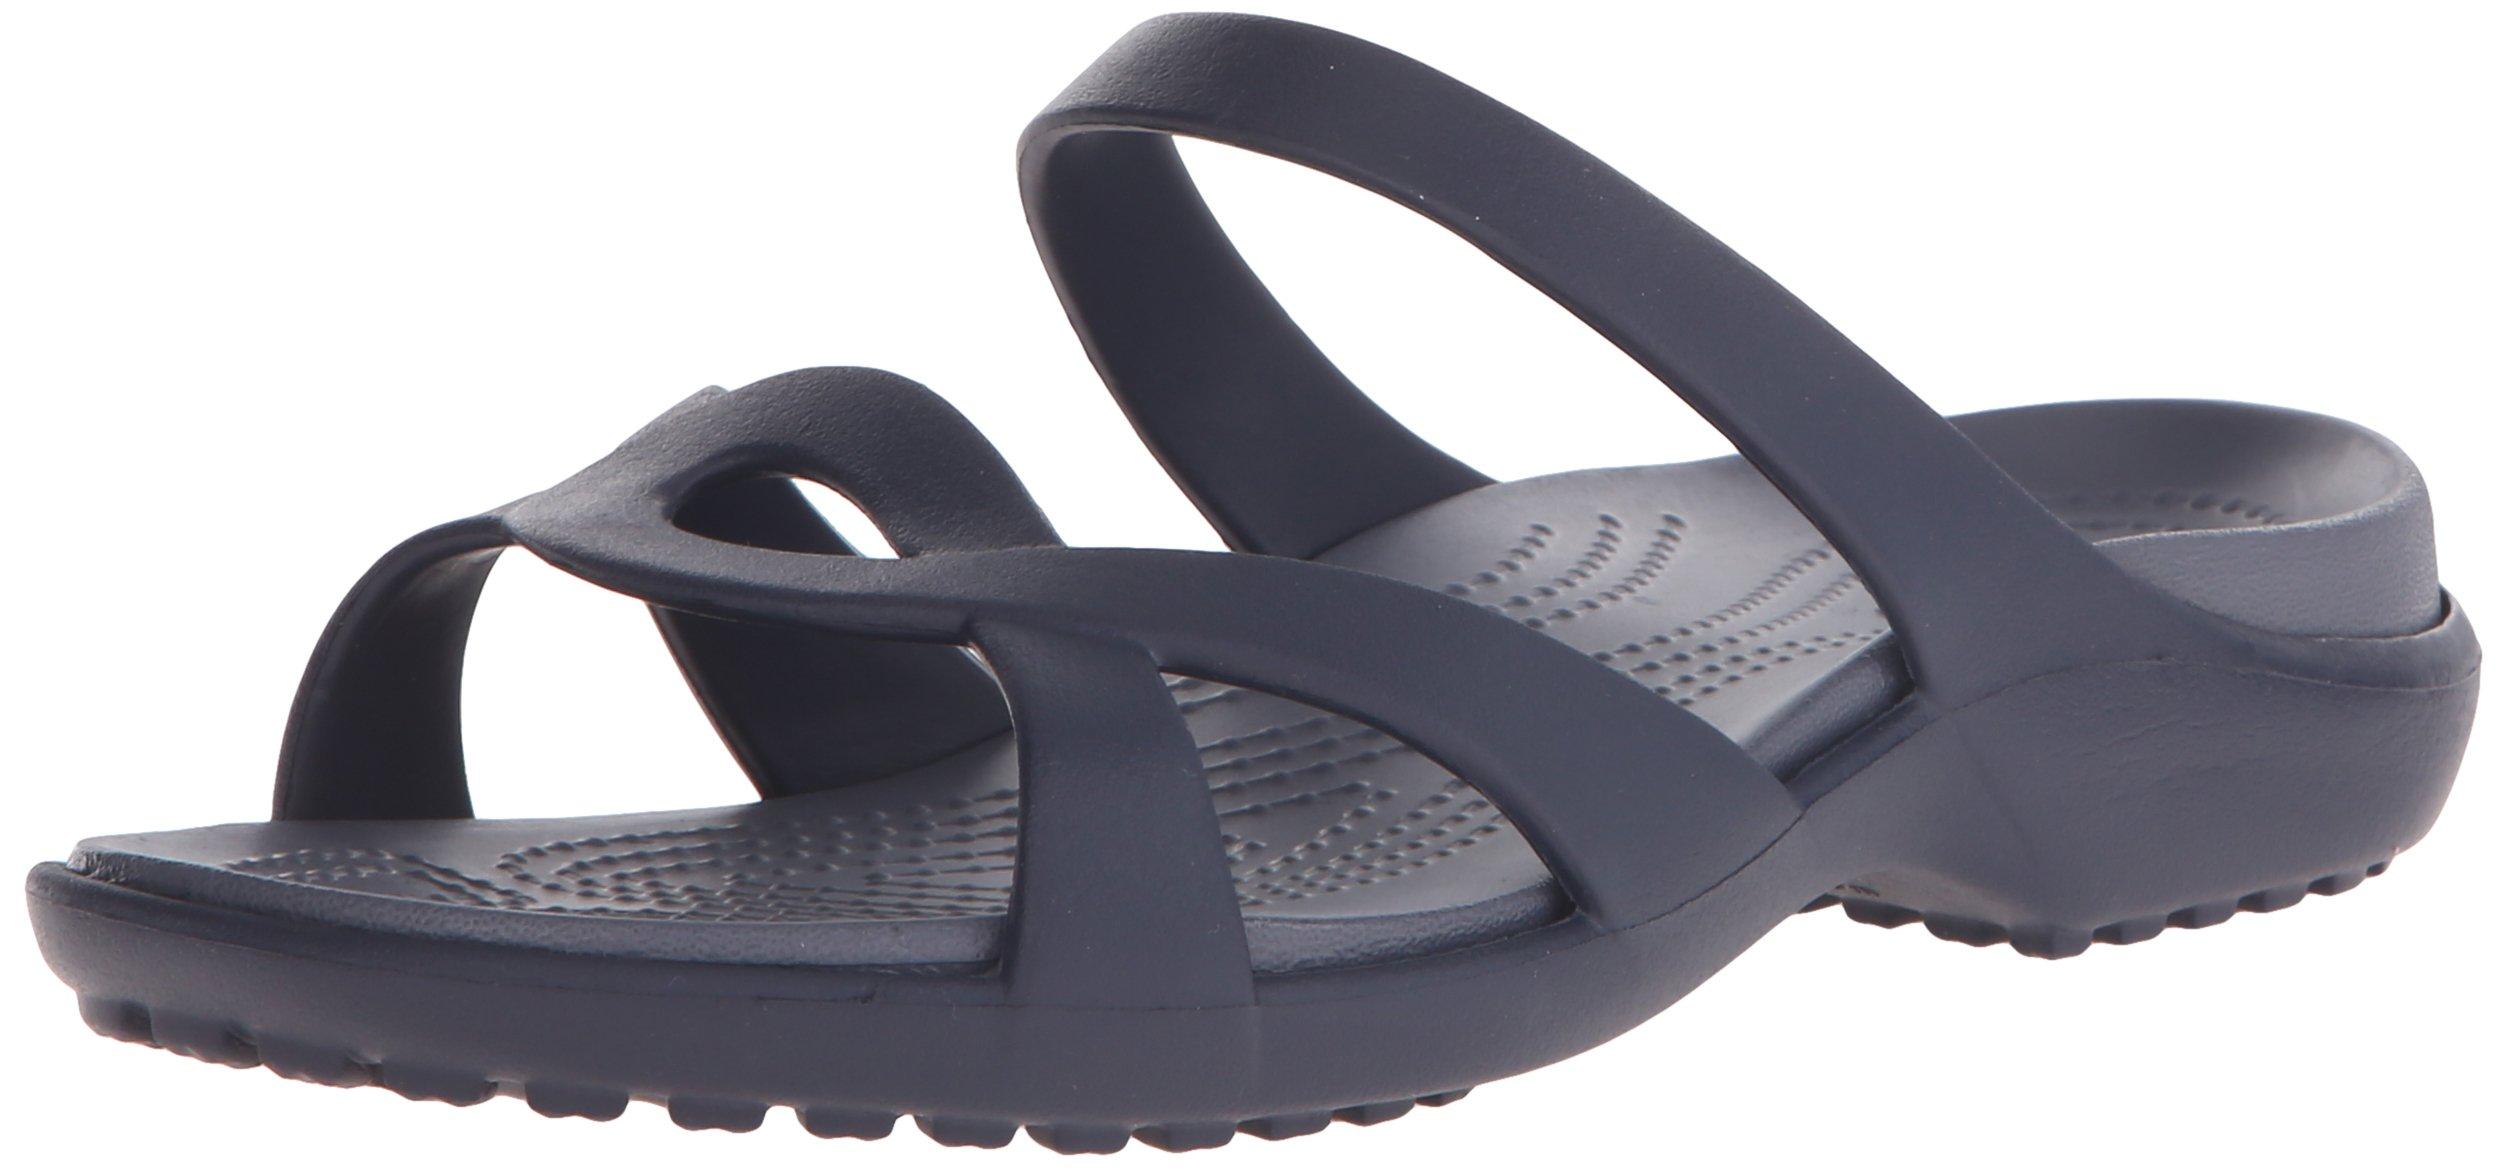 Crocs Women's Meleen Twist Sandal, Navy/Storm, 8 M US